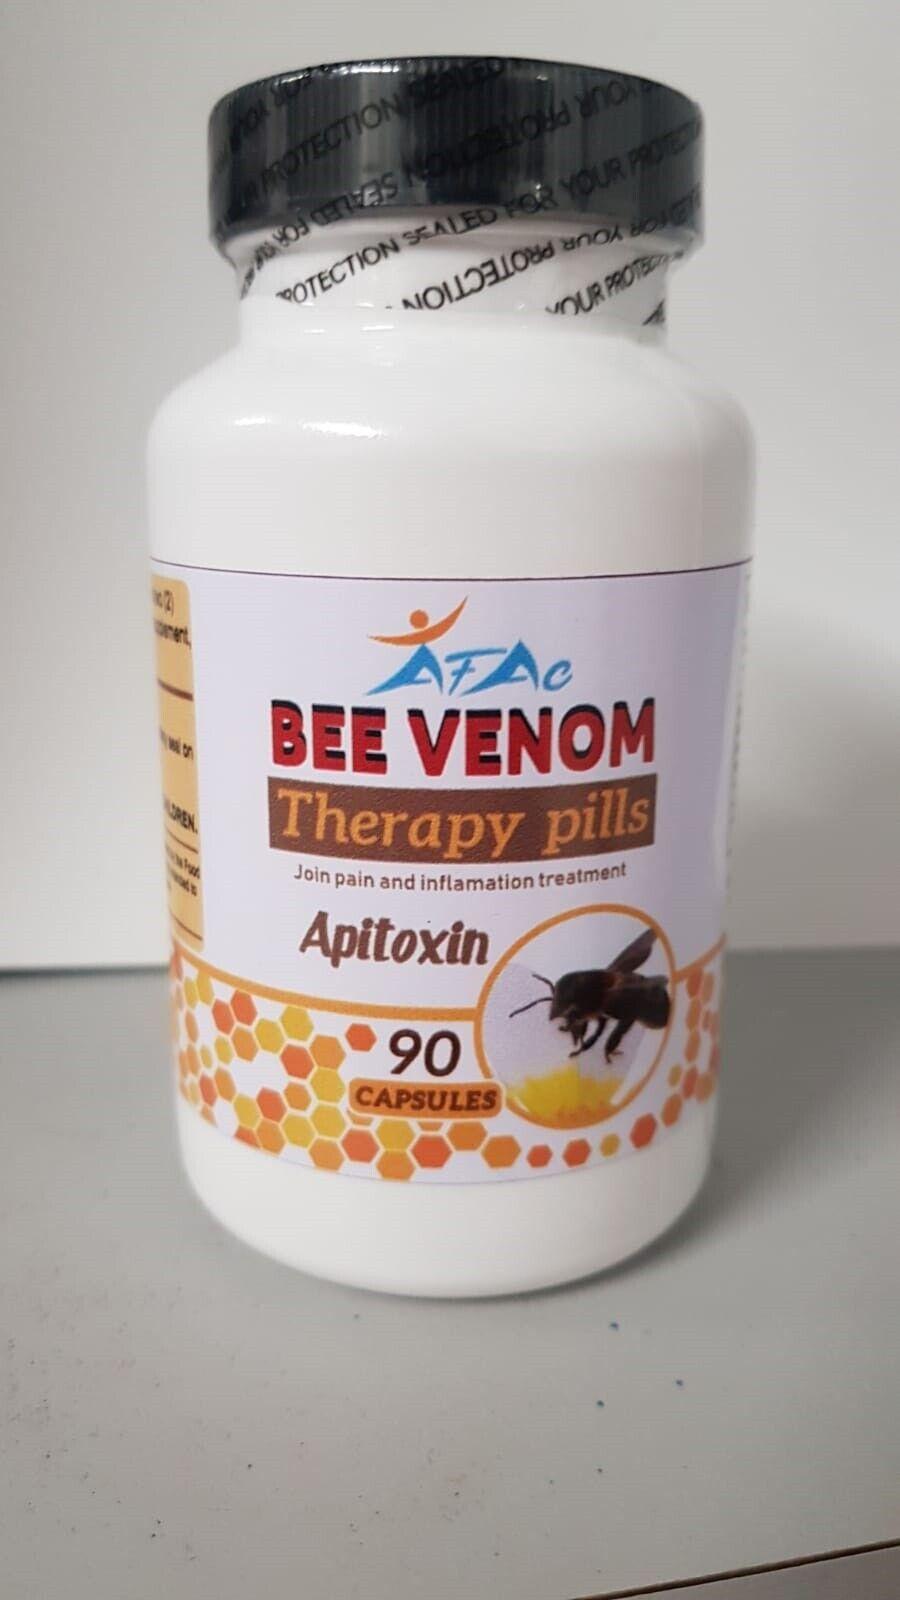 B-VENOM anti-inflamatory Arthritis Pain abeemed bio bee therapy CREAM  1